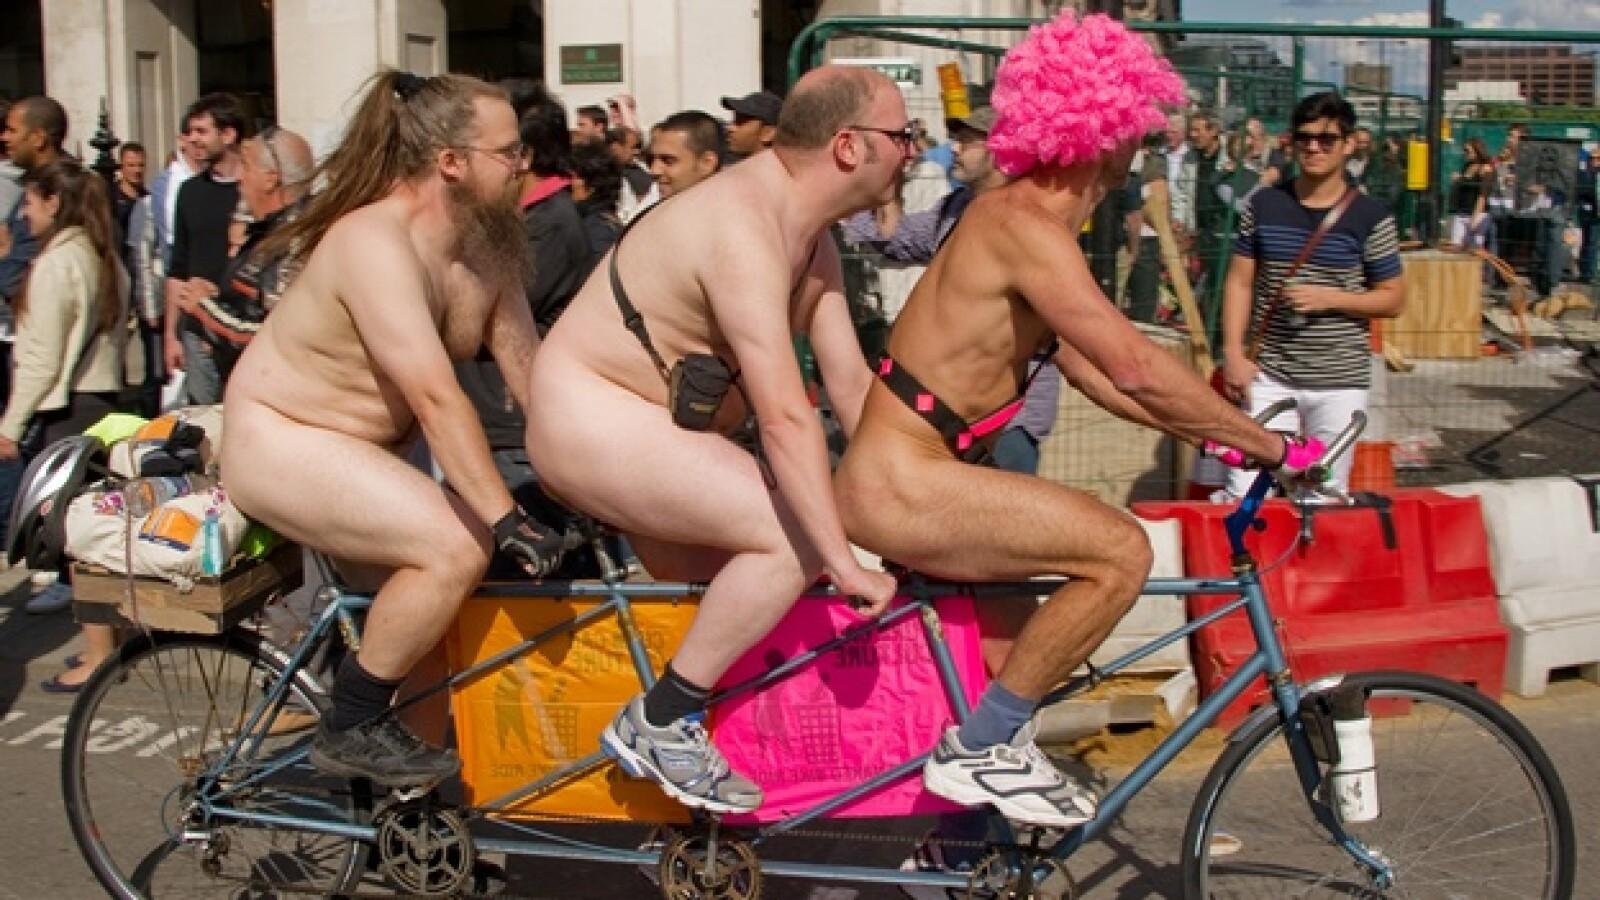 ciclistas desnudos en gran bretaña